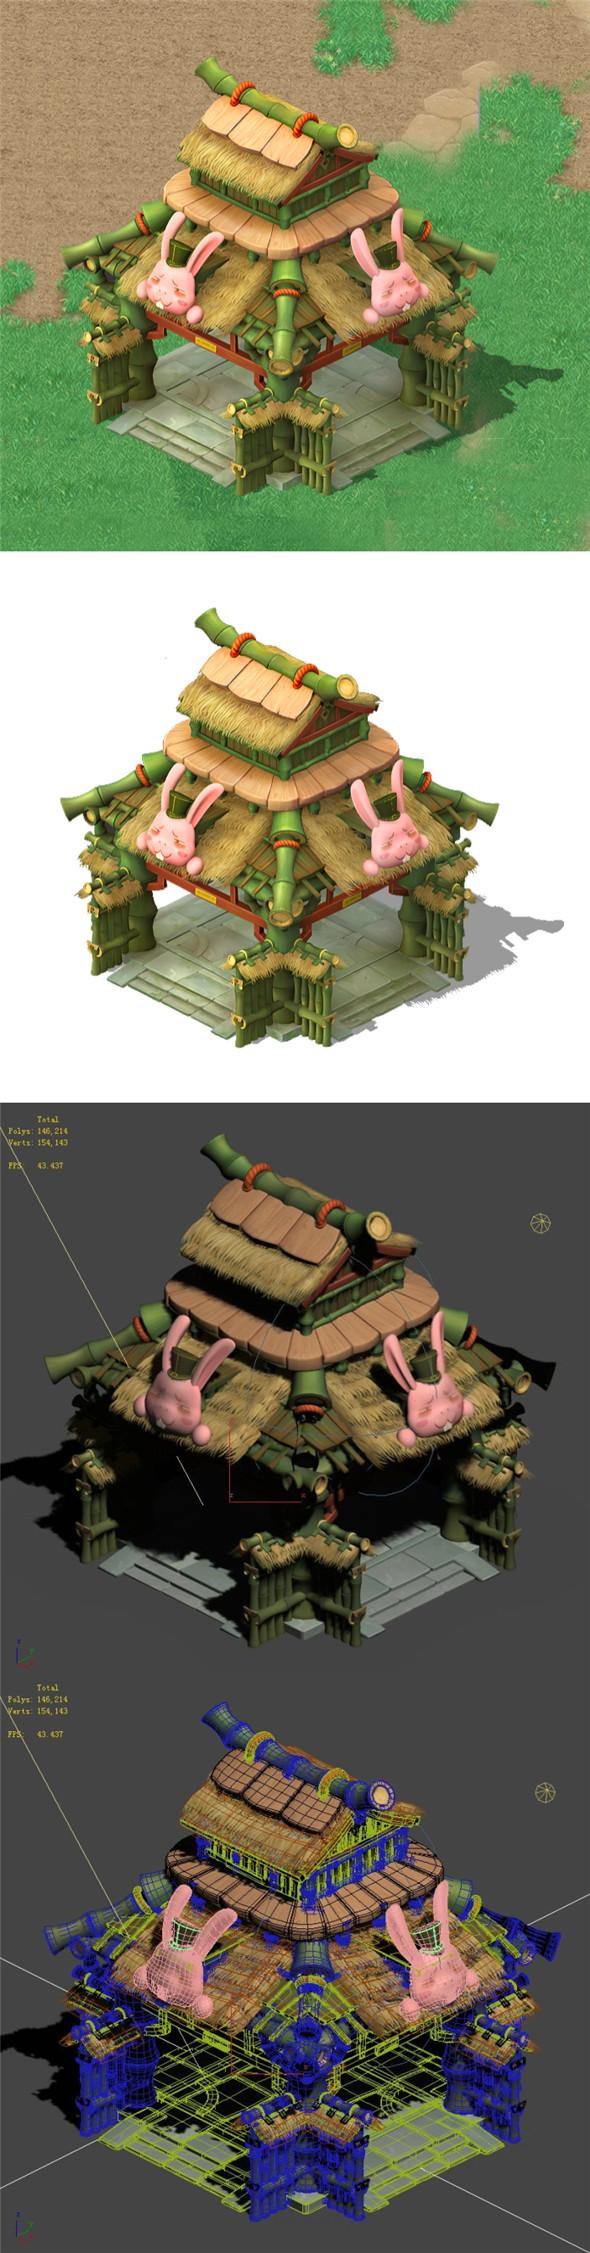 Cartoon World - Little Pavilion - 3DOcean Item for Sale